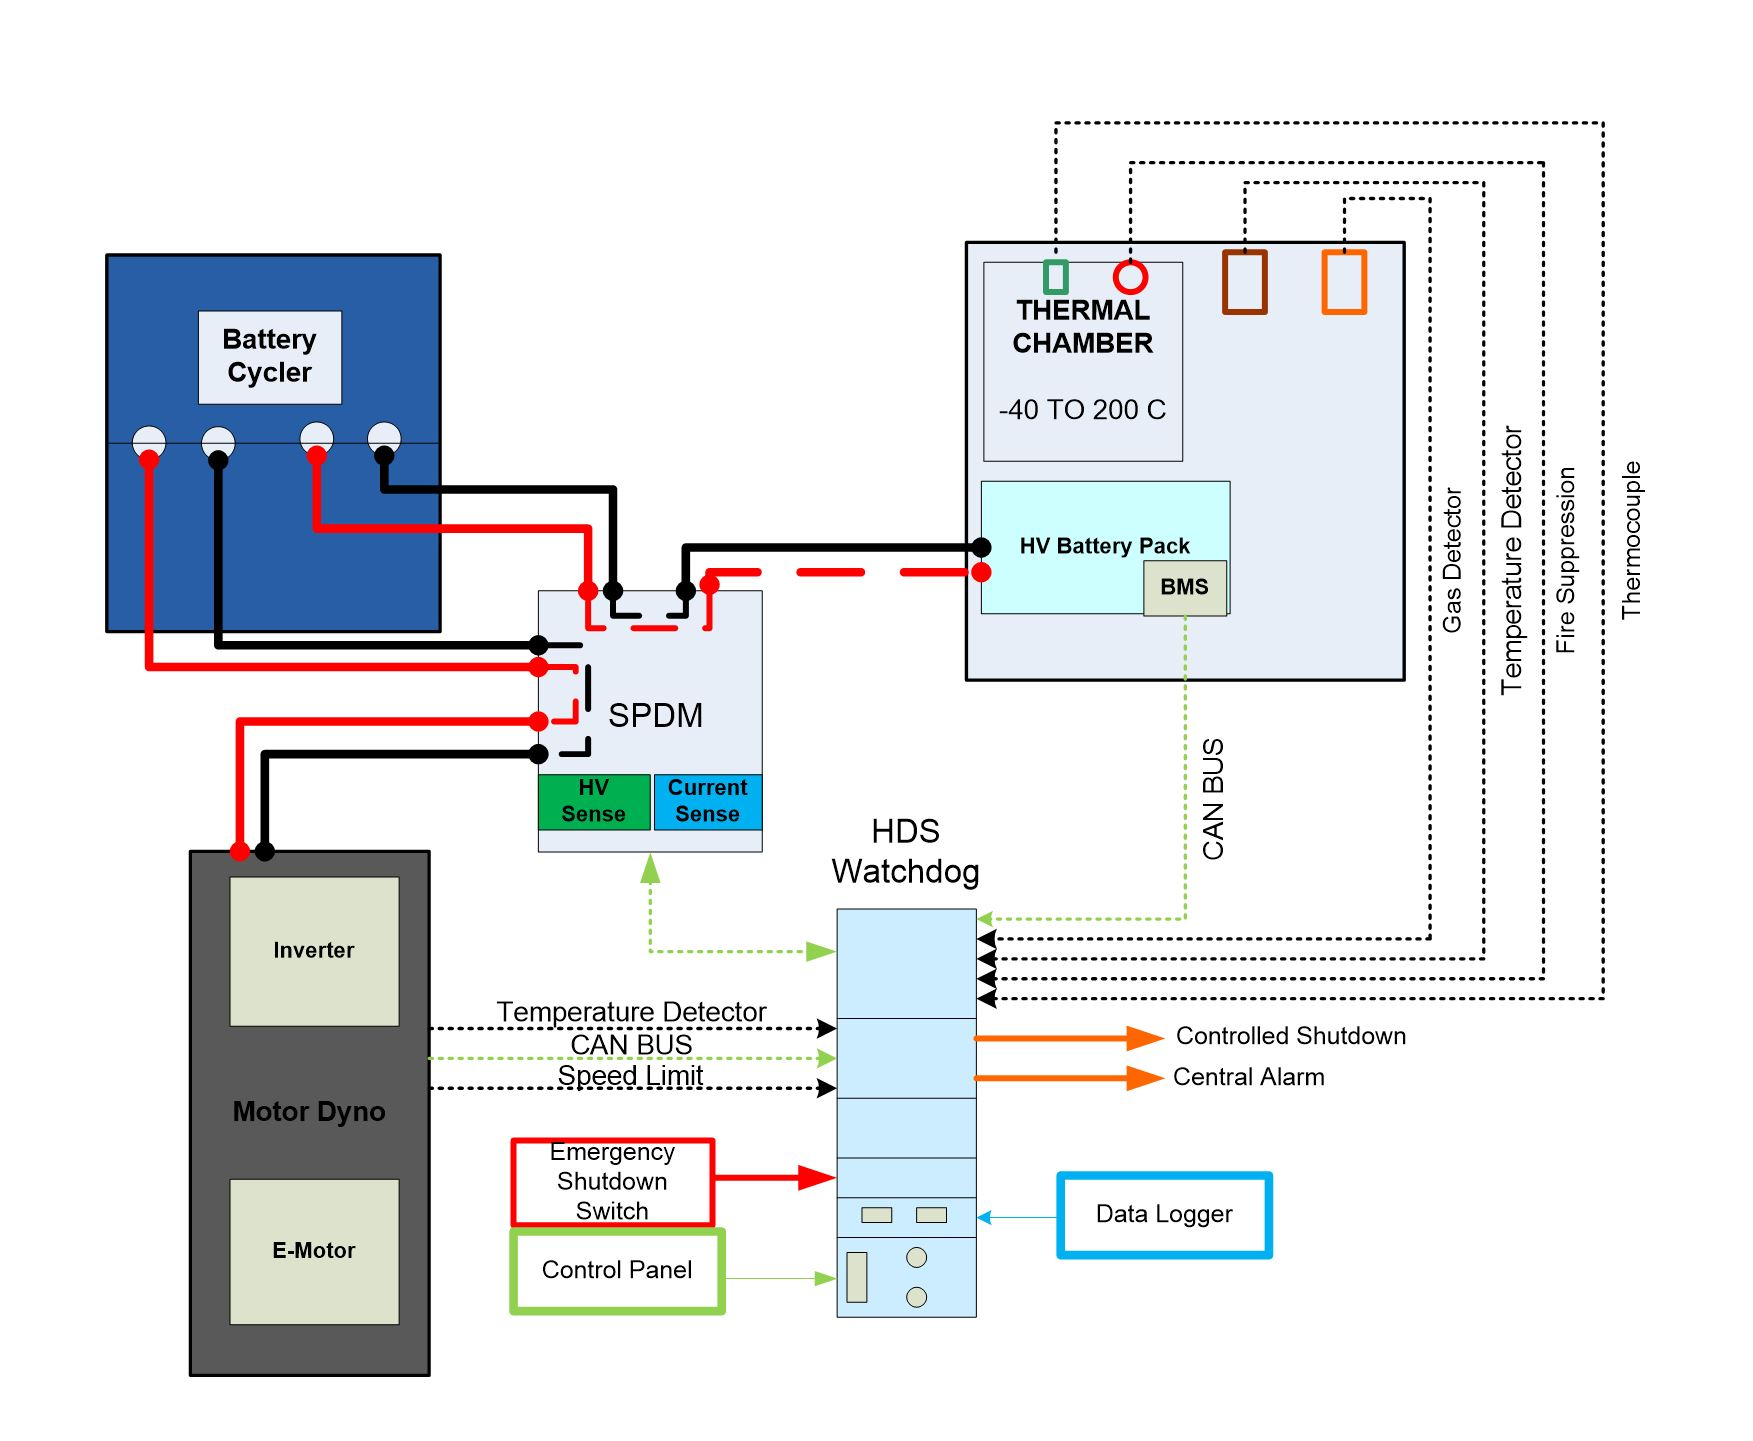 Hds Electronics Electronic Watchdog Circuit Diagram System